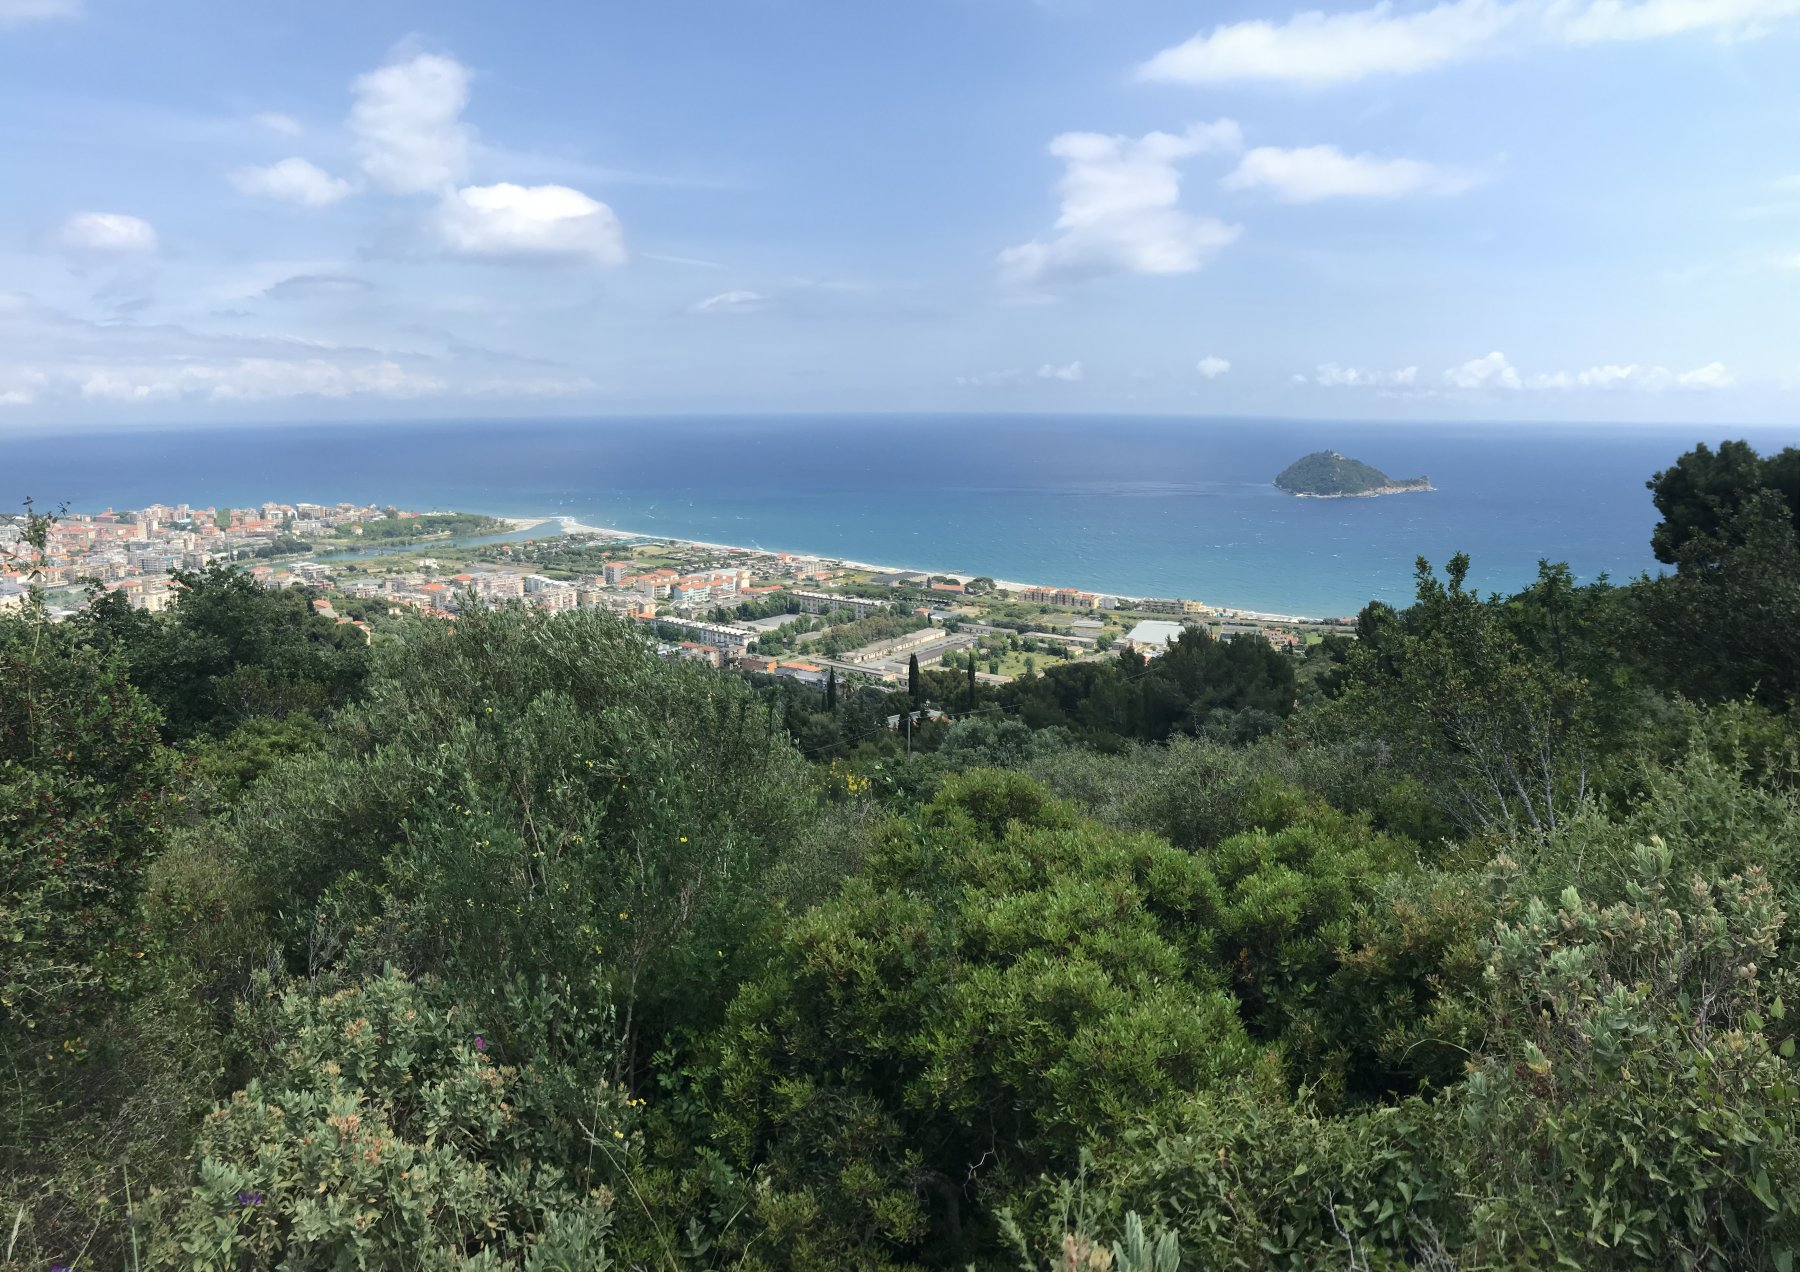 Rientro su Albenga